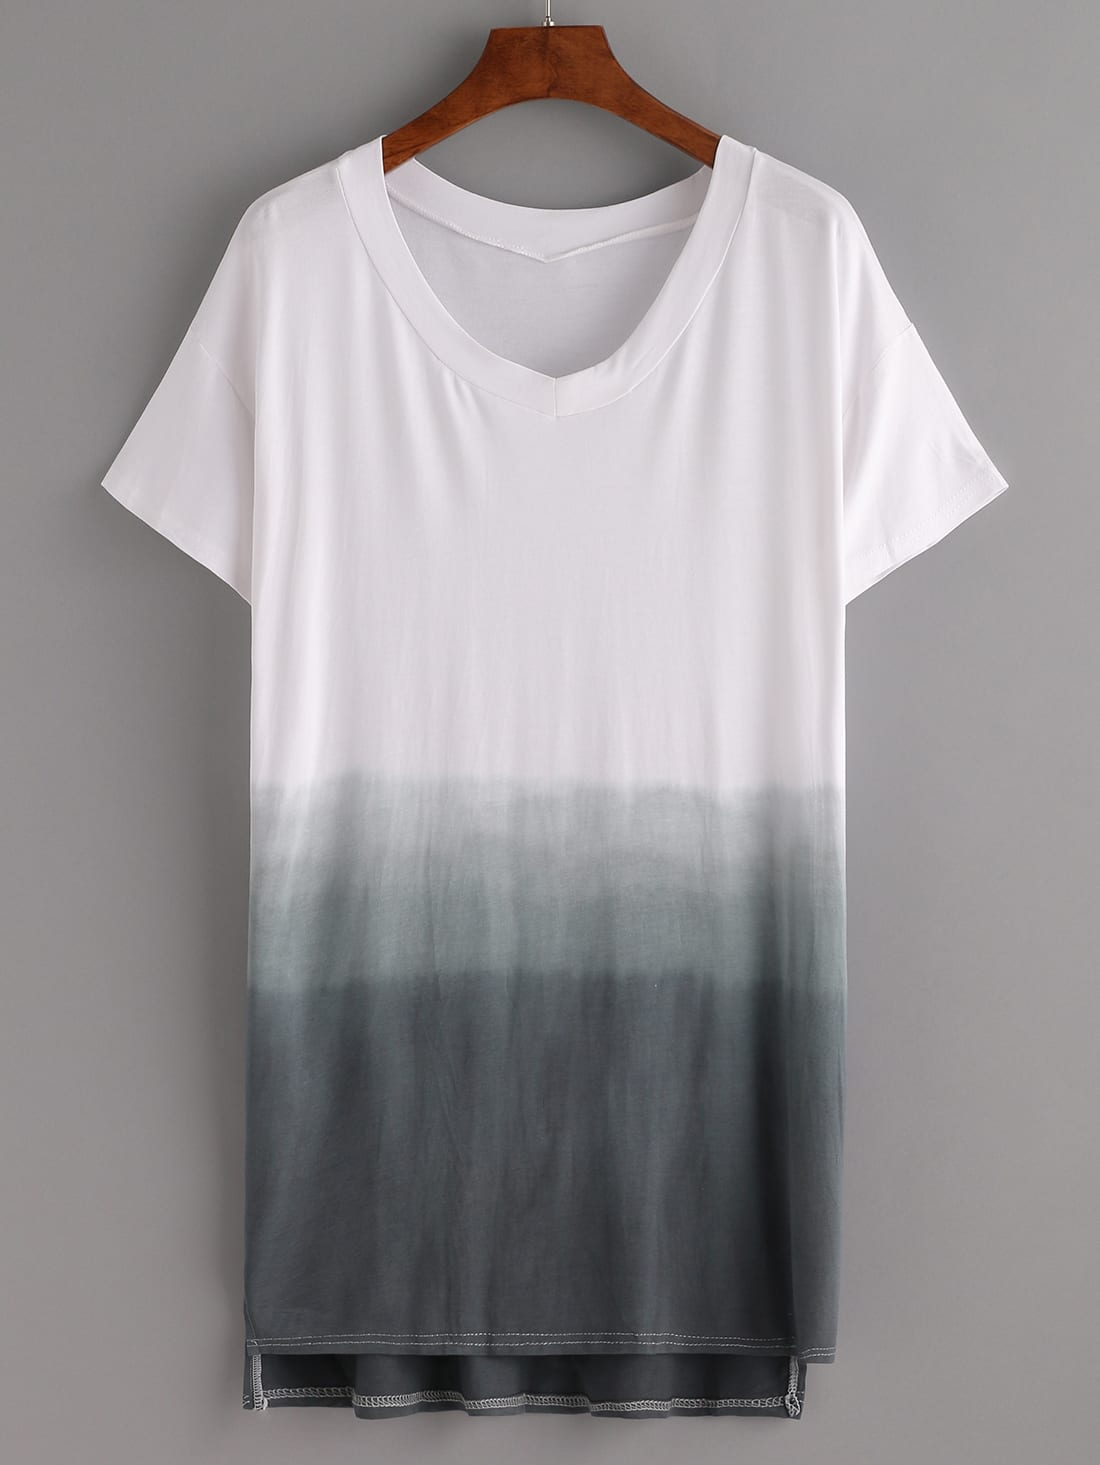 t shirt kleid hinten l nger mit farbverlauf german shein. Black Bedroom Furniture Sets. Home Design Ideas